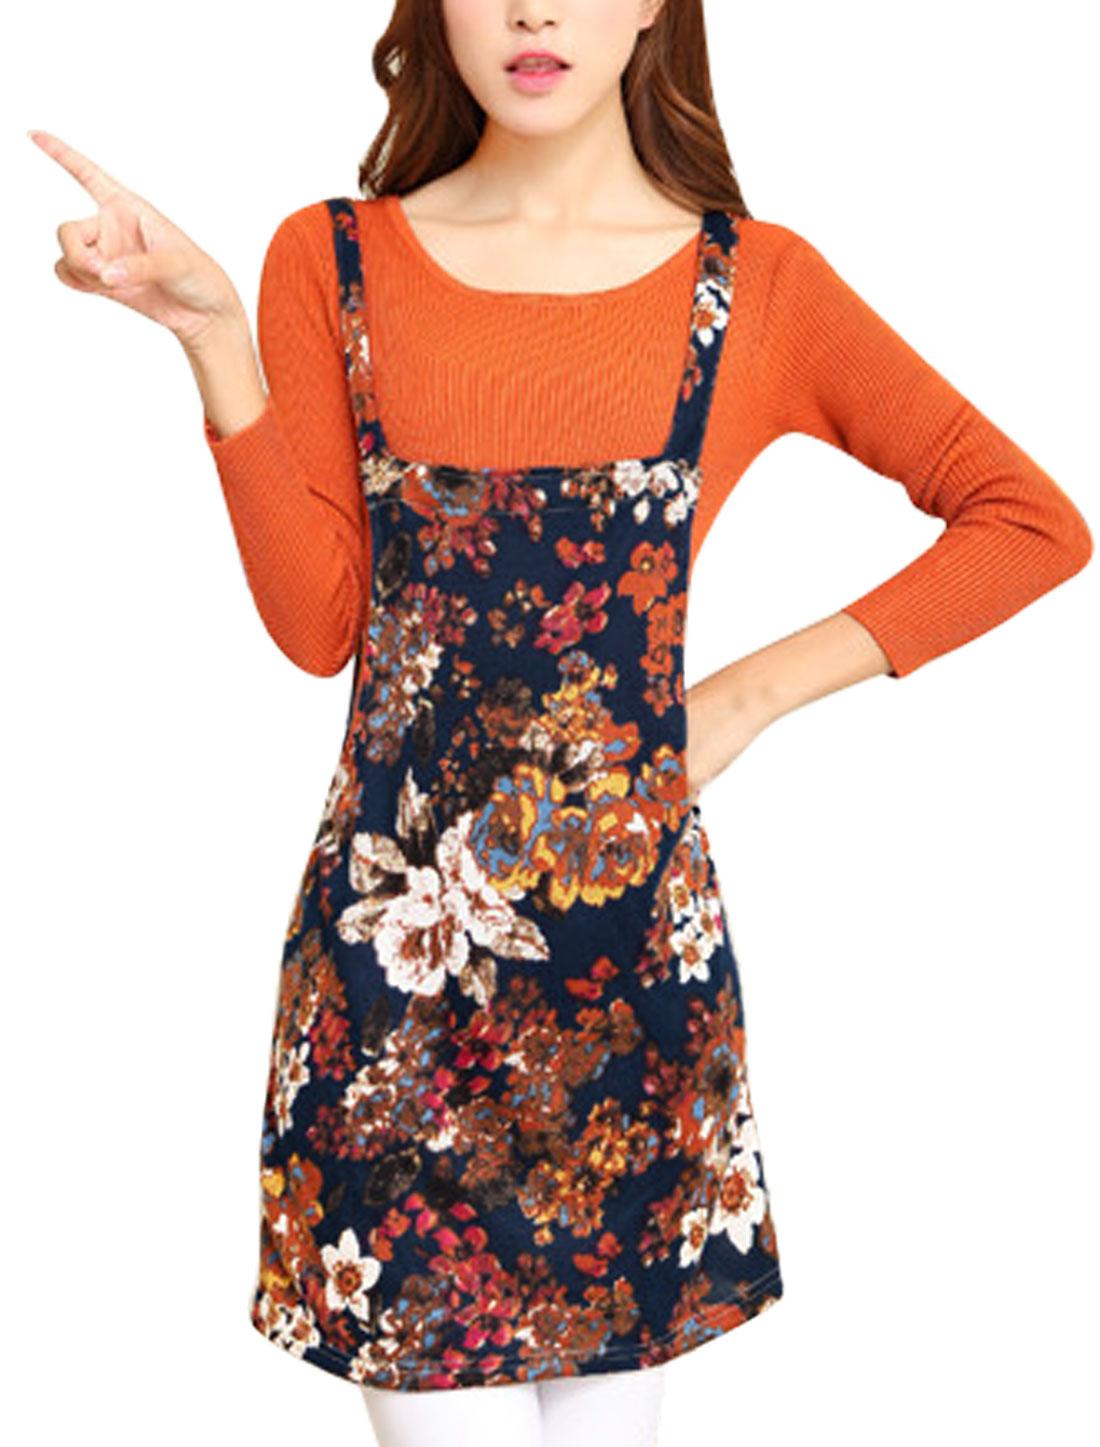 Lady Floral Pattern Square Neck Straight Suspender Dress Navy Blue M